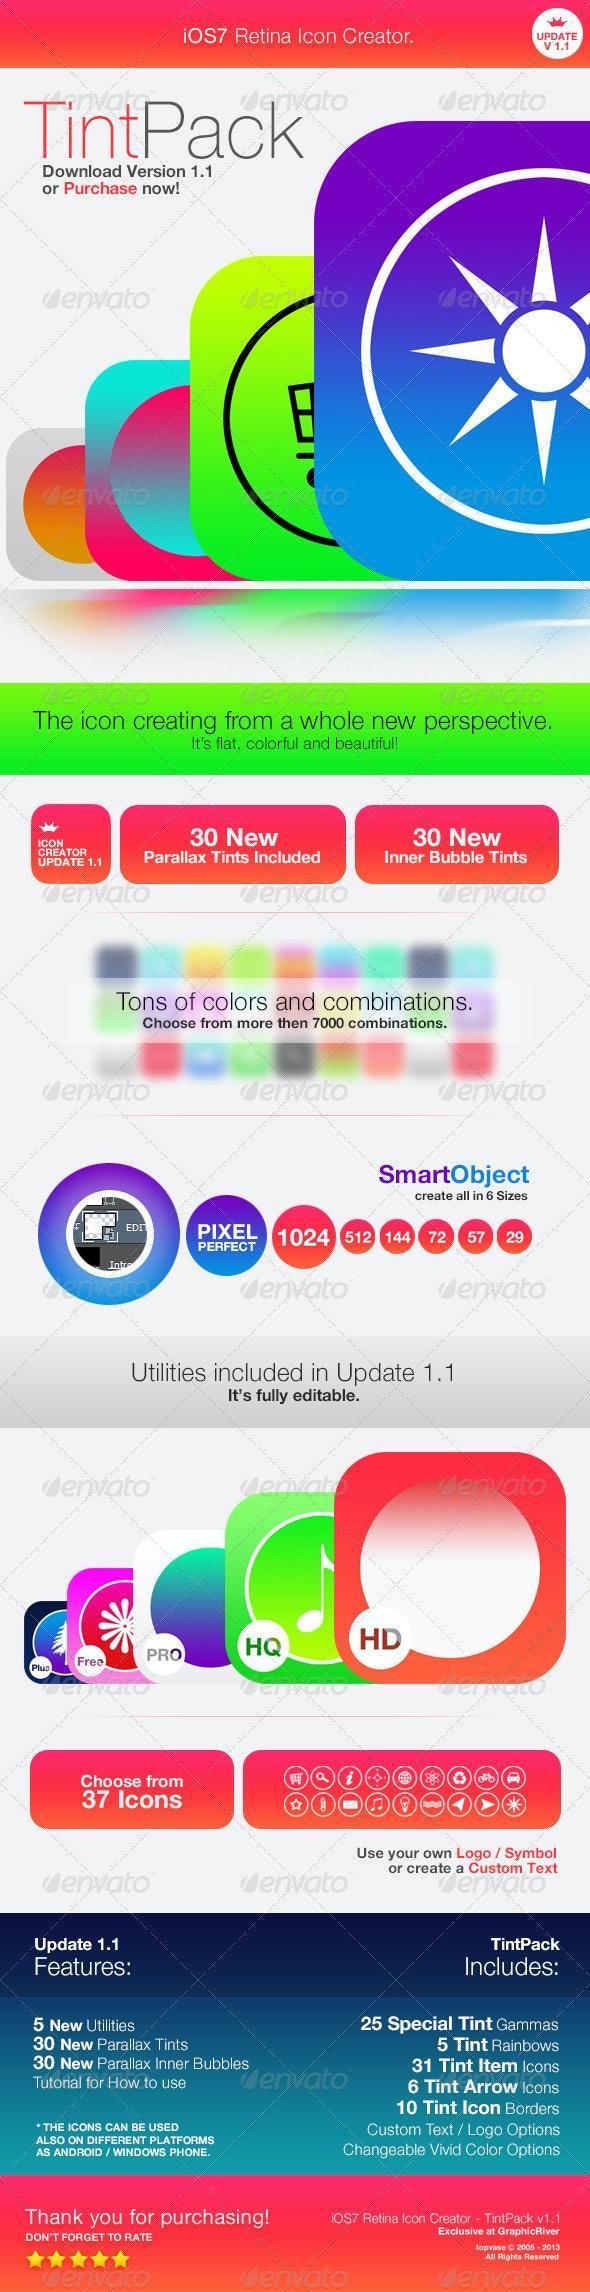 Retina Icon Creator - TintPack - Software Icons